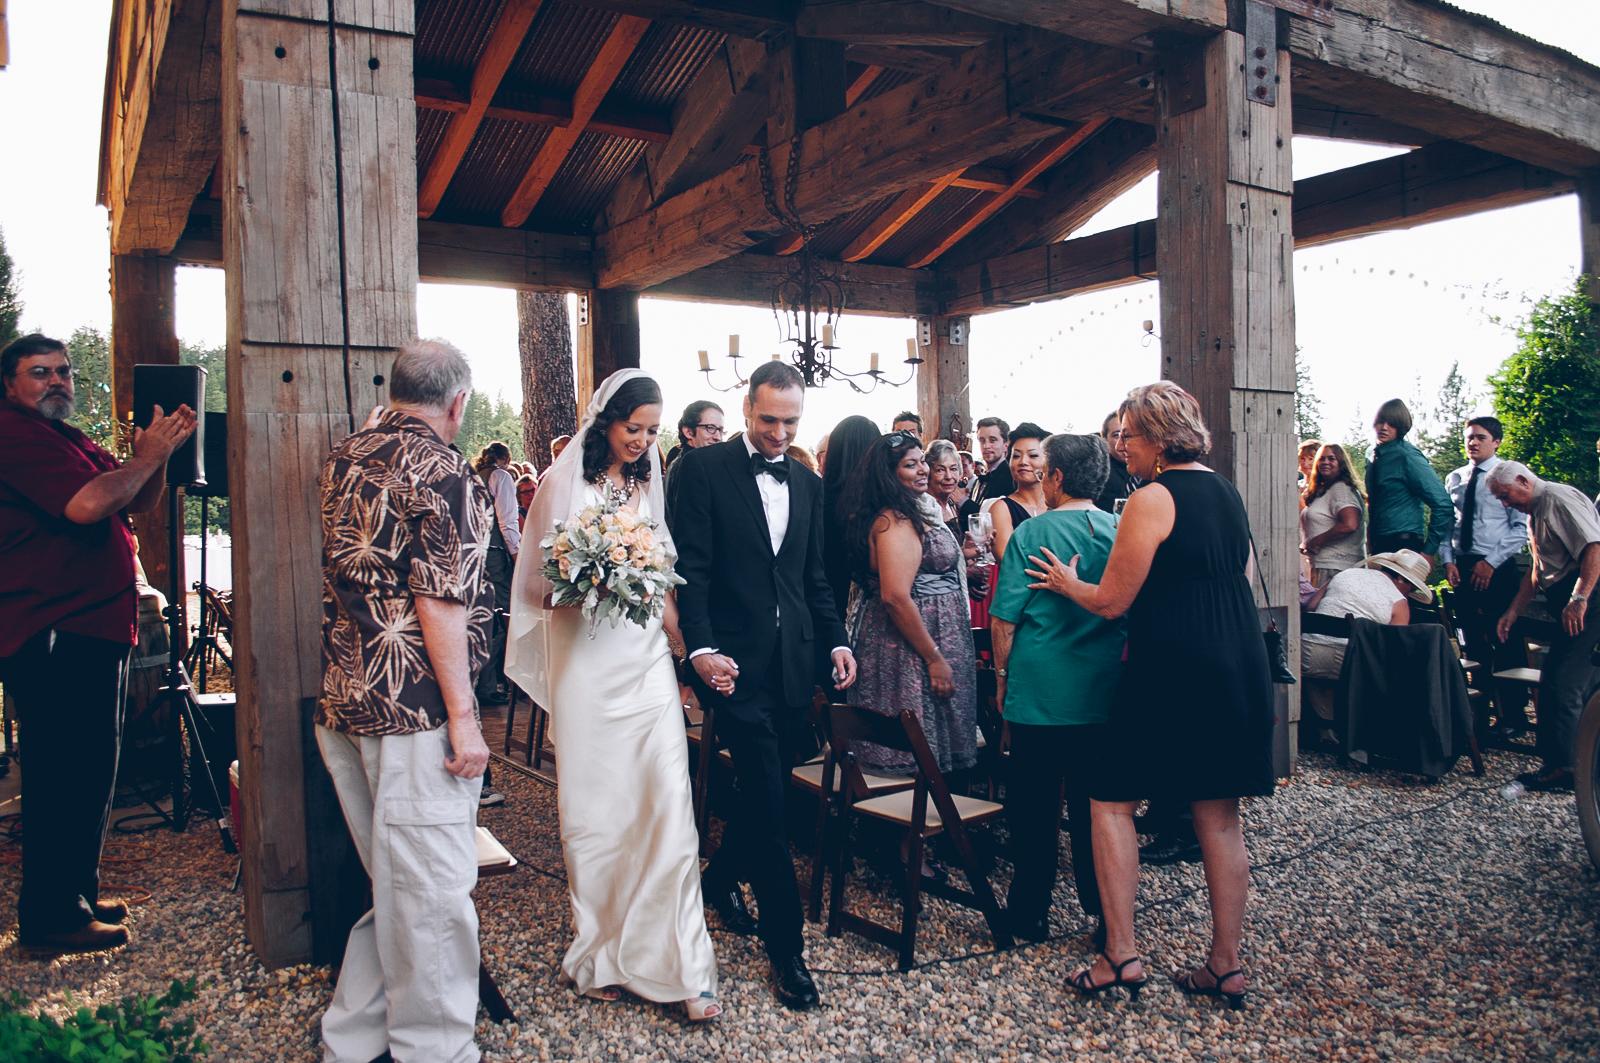 miraflores_winery_wedding_photography_ian_melissa_ebony_siovhan_bokeh_photography_25.jpg